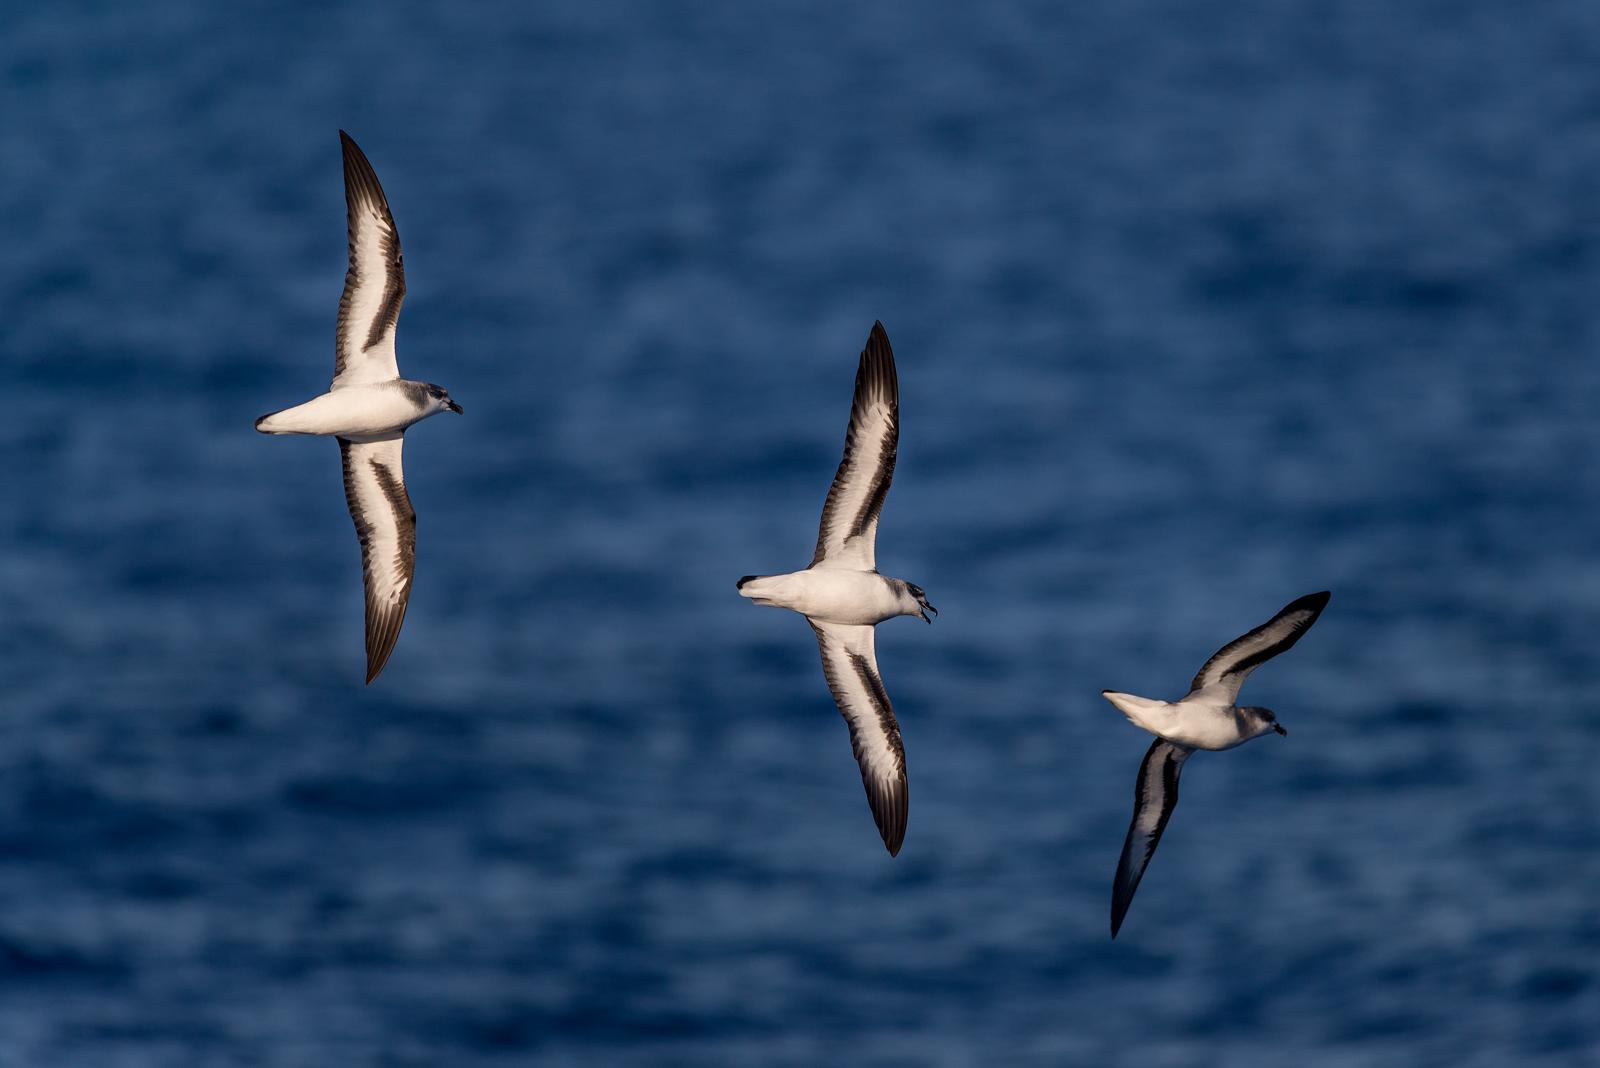 Three black-winged petrels in flight formation.